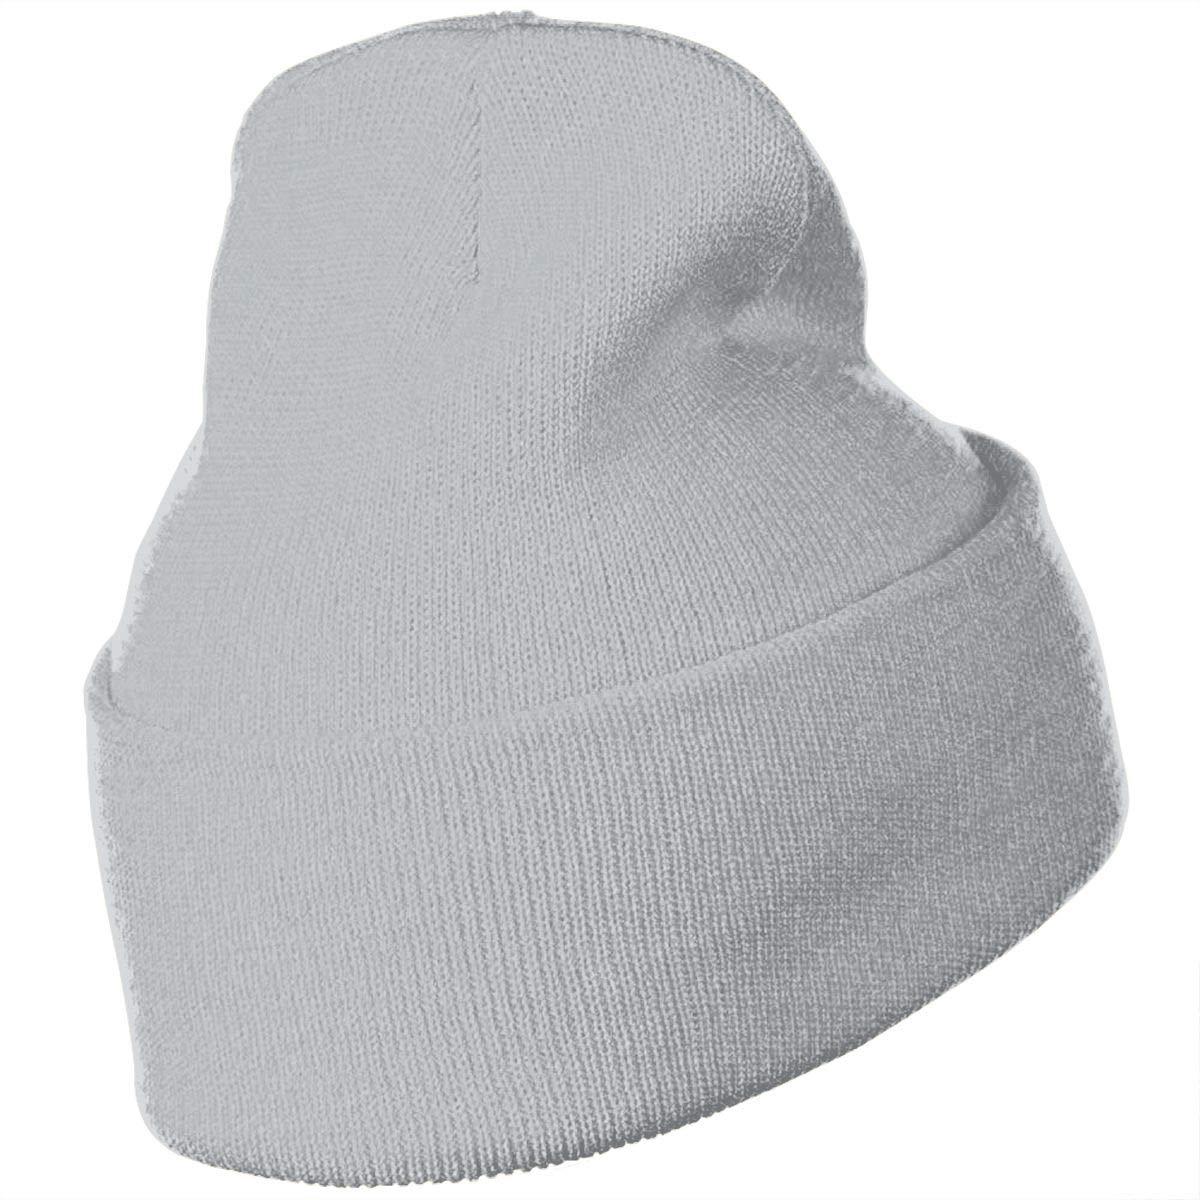 QZqDQ Abstract Geometric Unisex Fashion Knitted Hat Luxury Hip-Hop Cap